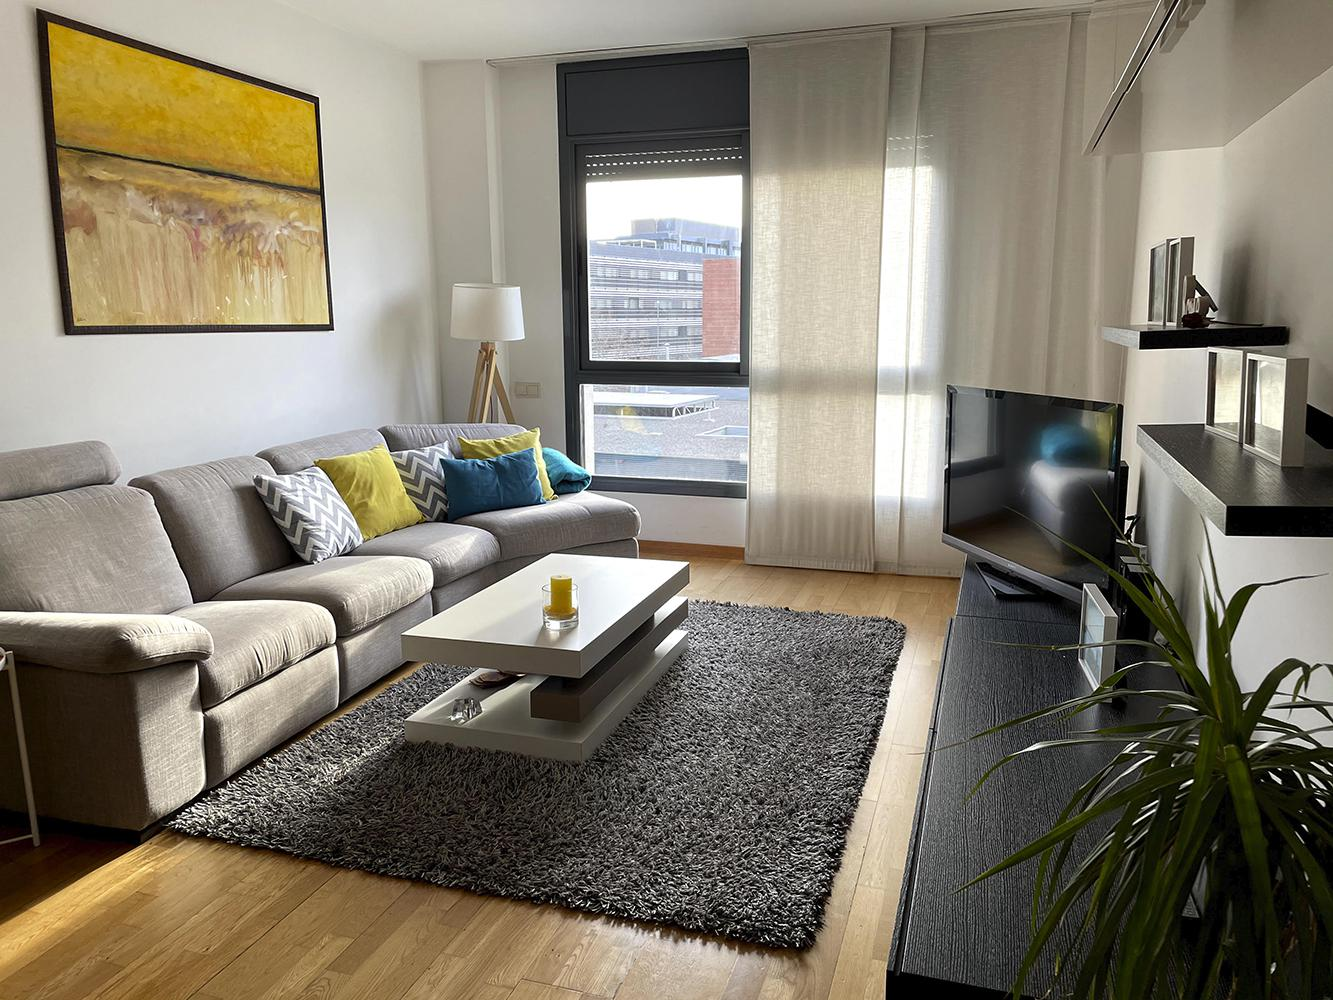 Imagen 2 Piso en alquiler en Barcelona / Pere iv con Bilbao